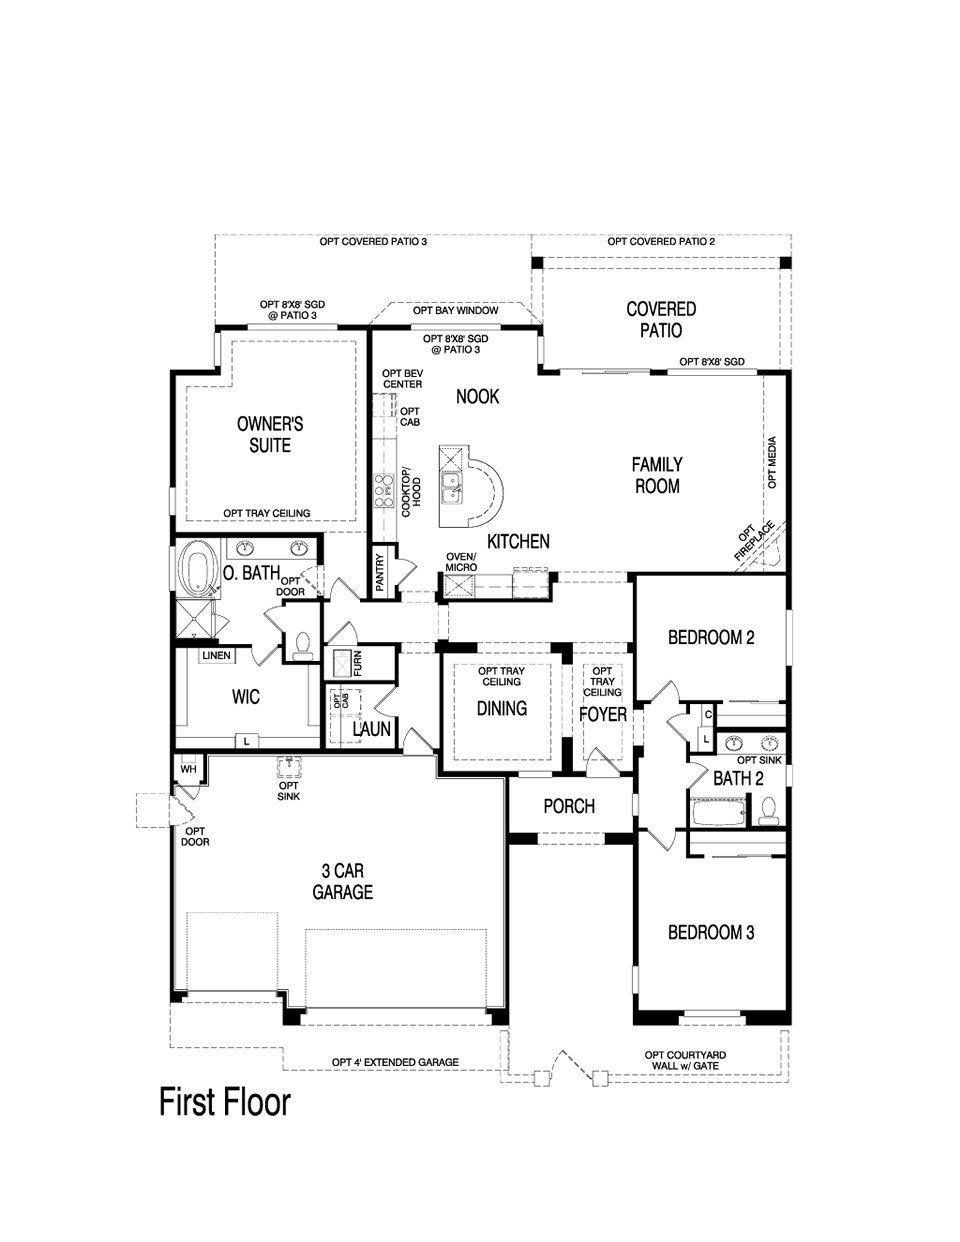 Pulte Homes Juniper Floor Plan Via Www Nmhometeam Com Floor Plans Pulte Homes Pulte